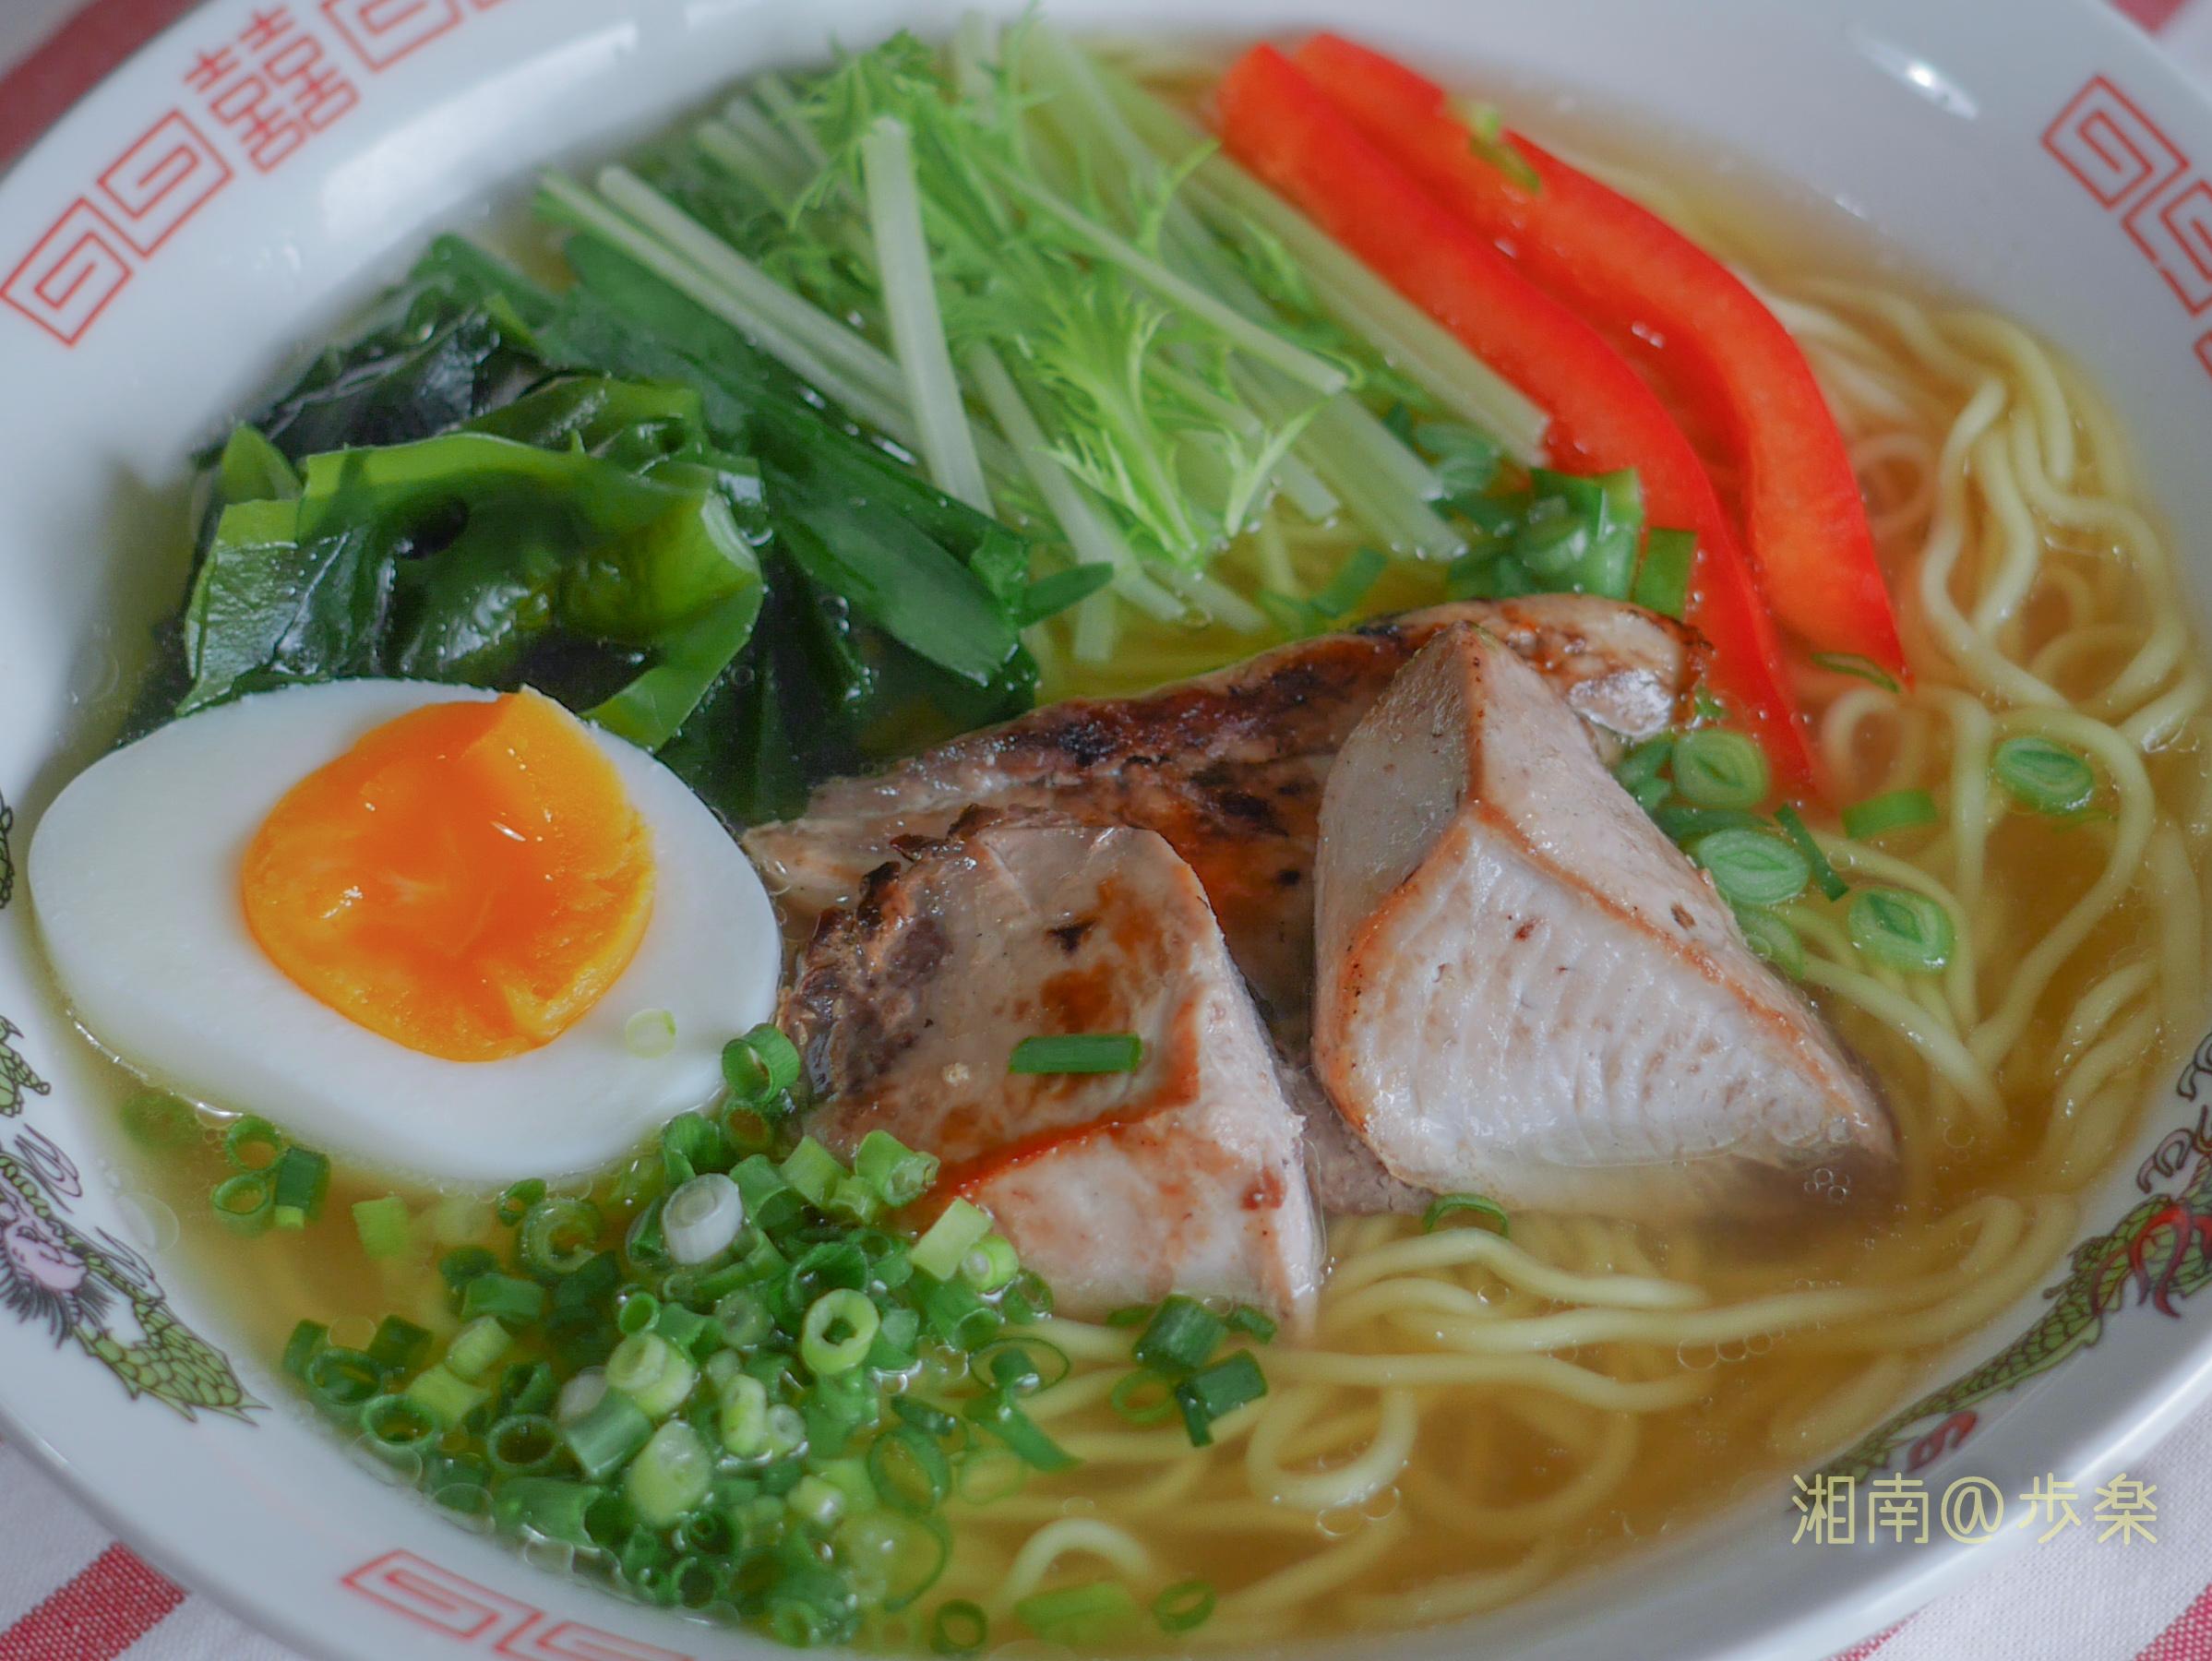 TOPVALU:麺とスープにこだわった塩ラーメン